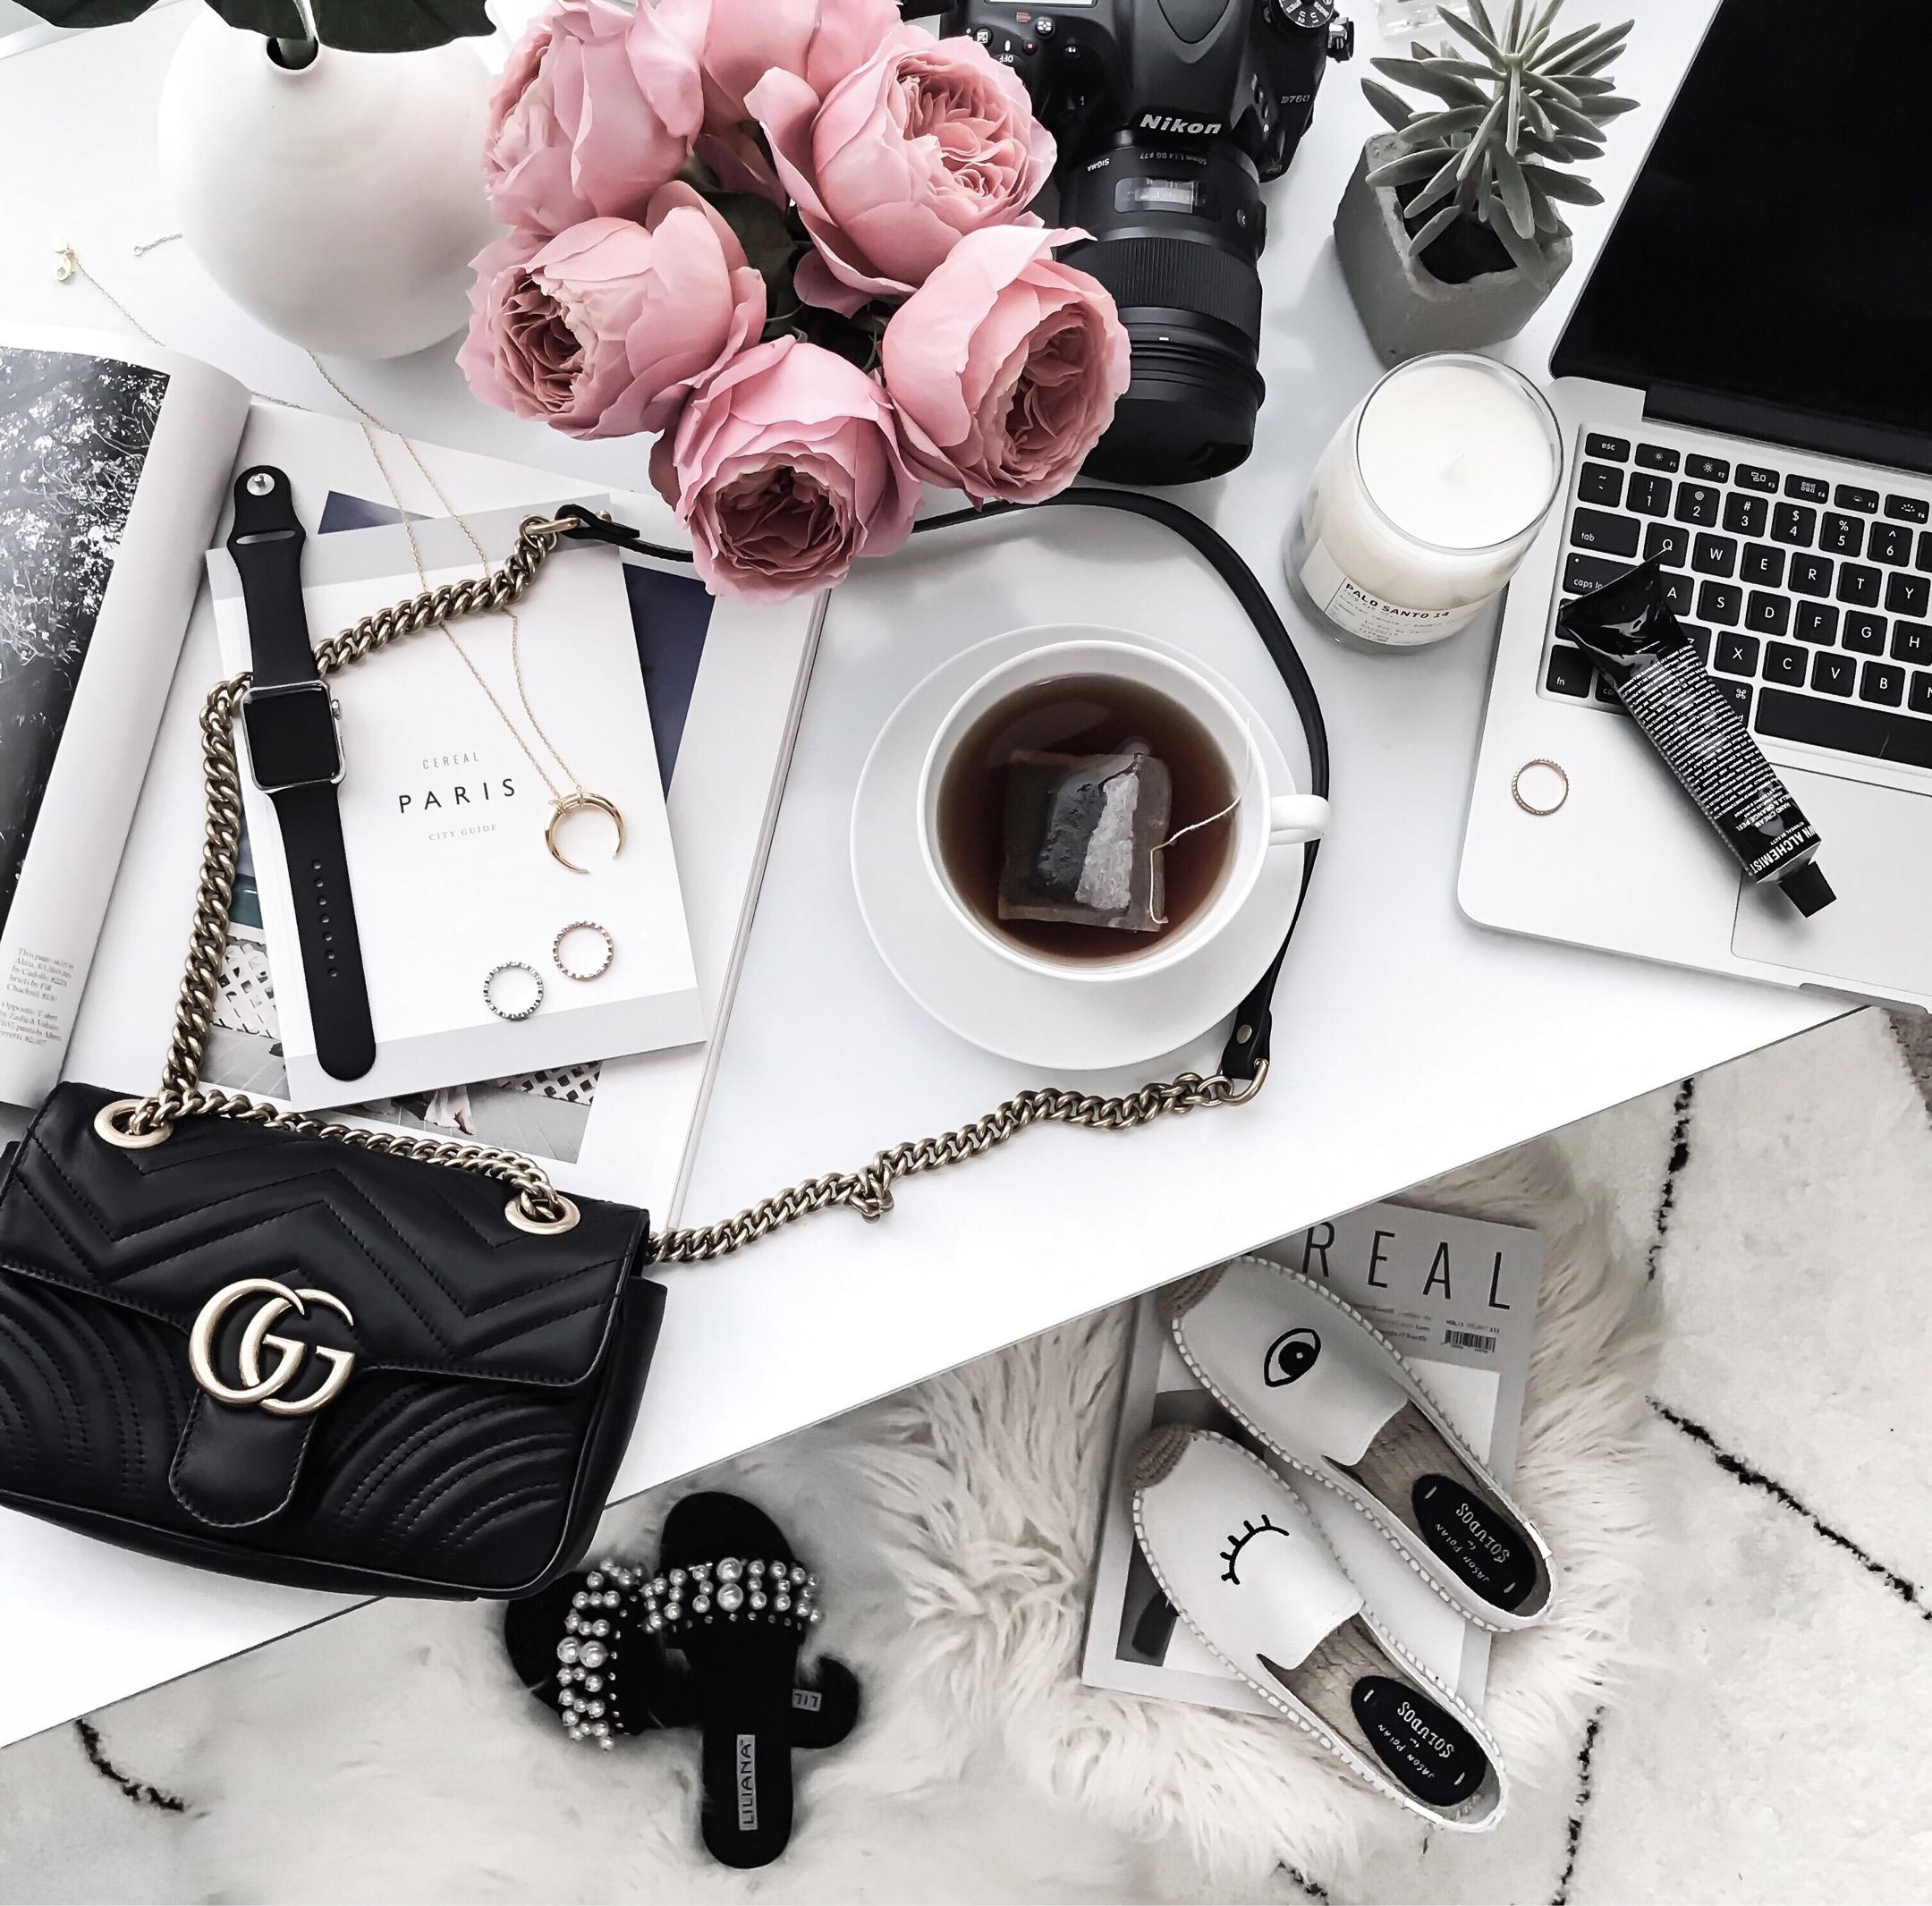 Tiffany Jais Houston fashion and lifestyle blogger | Gucci marmot bag, pearl slides, flatlay, vsco